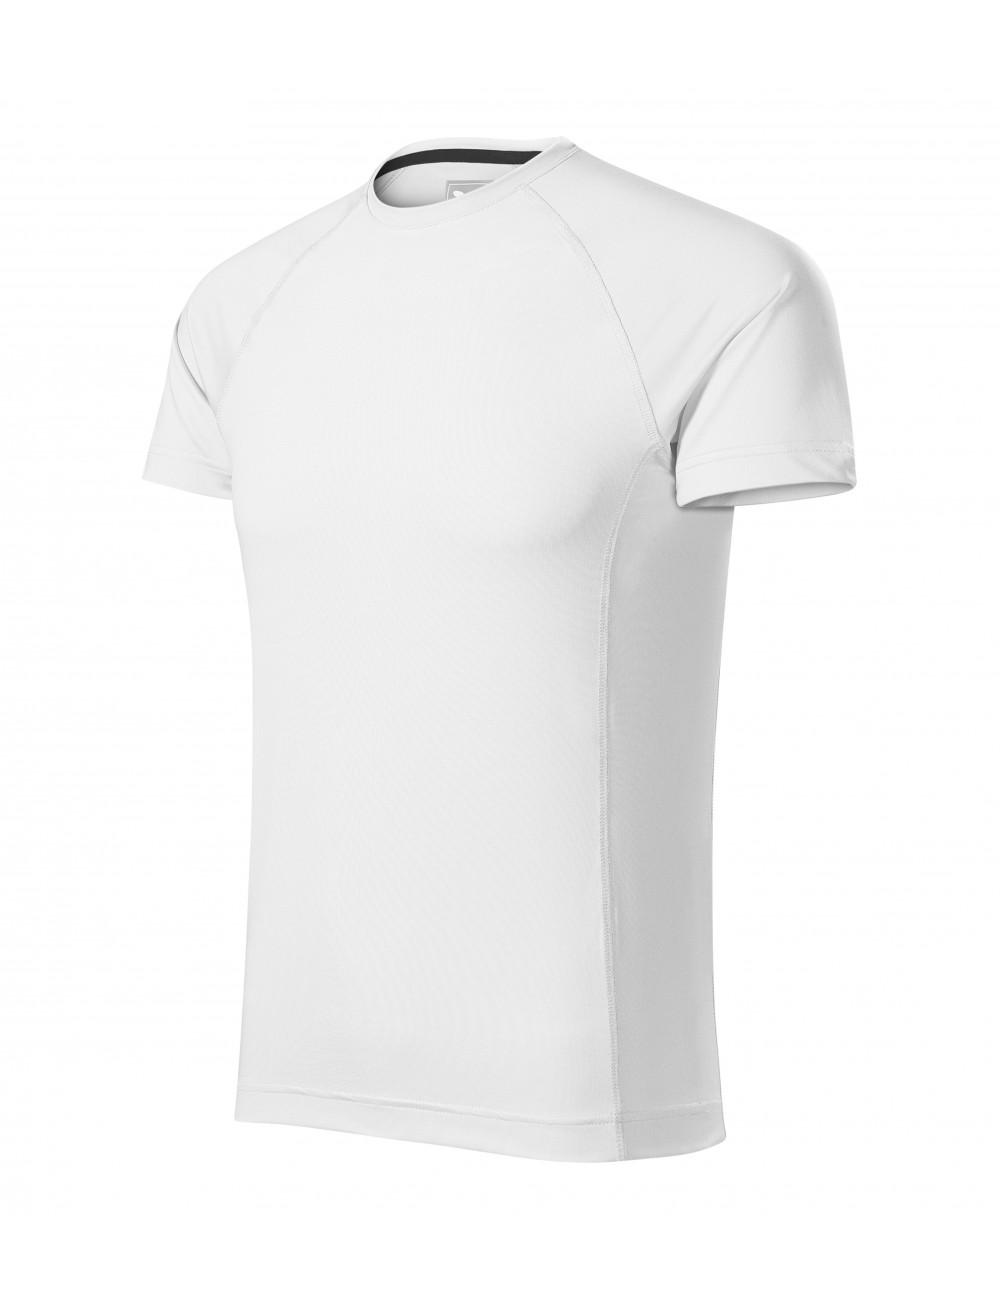 Adler MALFINI Koszulka męska Destiny 175 biały